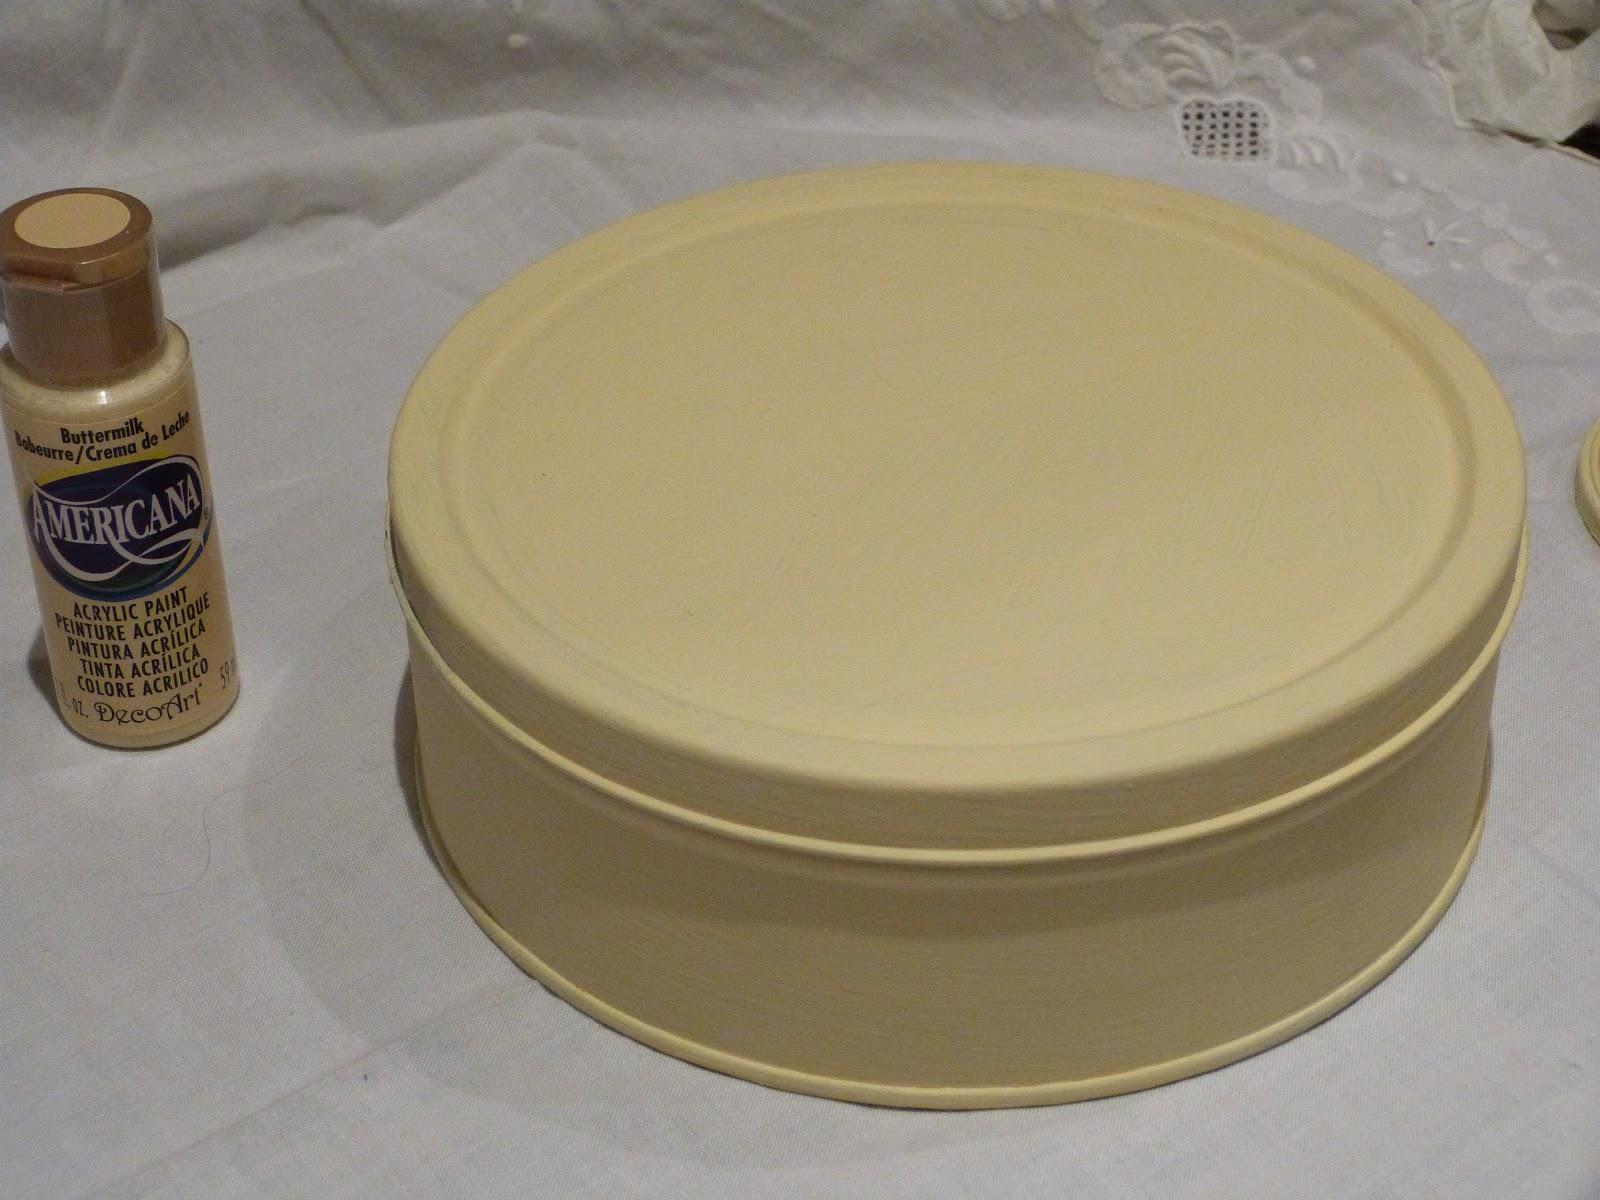 Renovando caja metal para galletas - Manualidades pintar caja metal ...